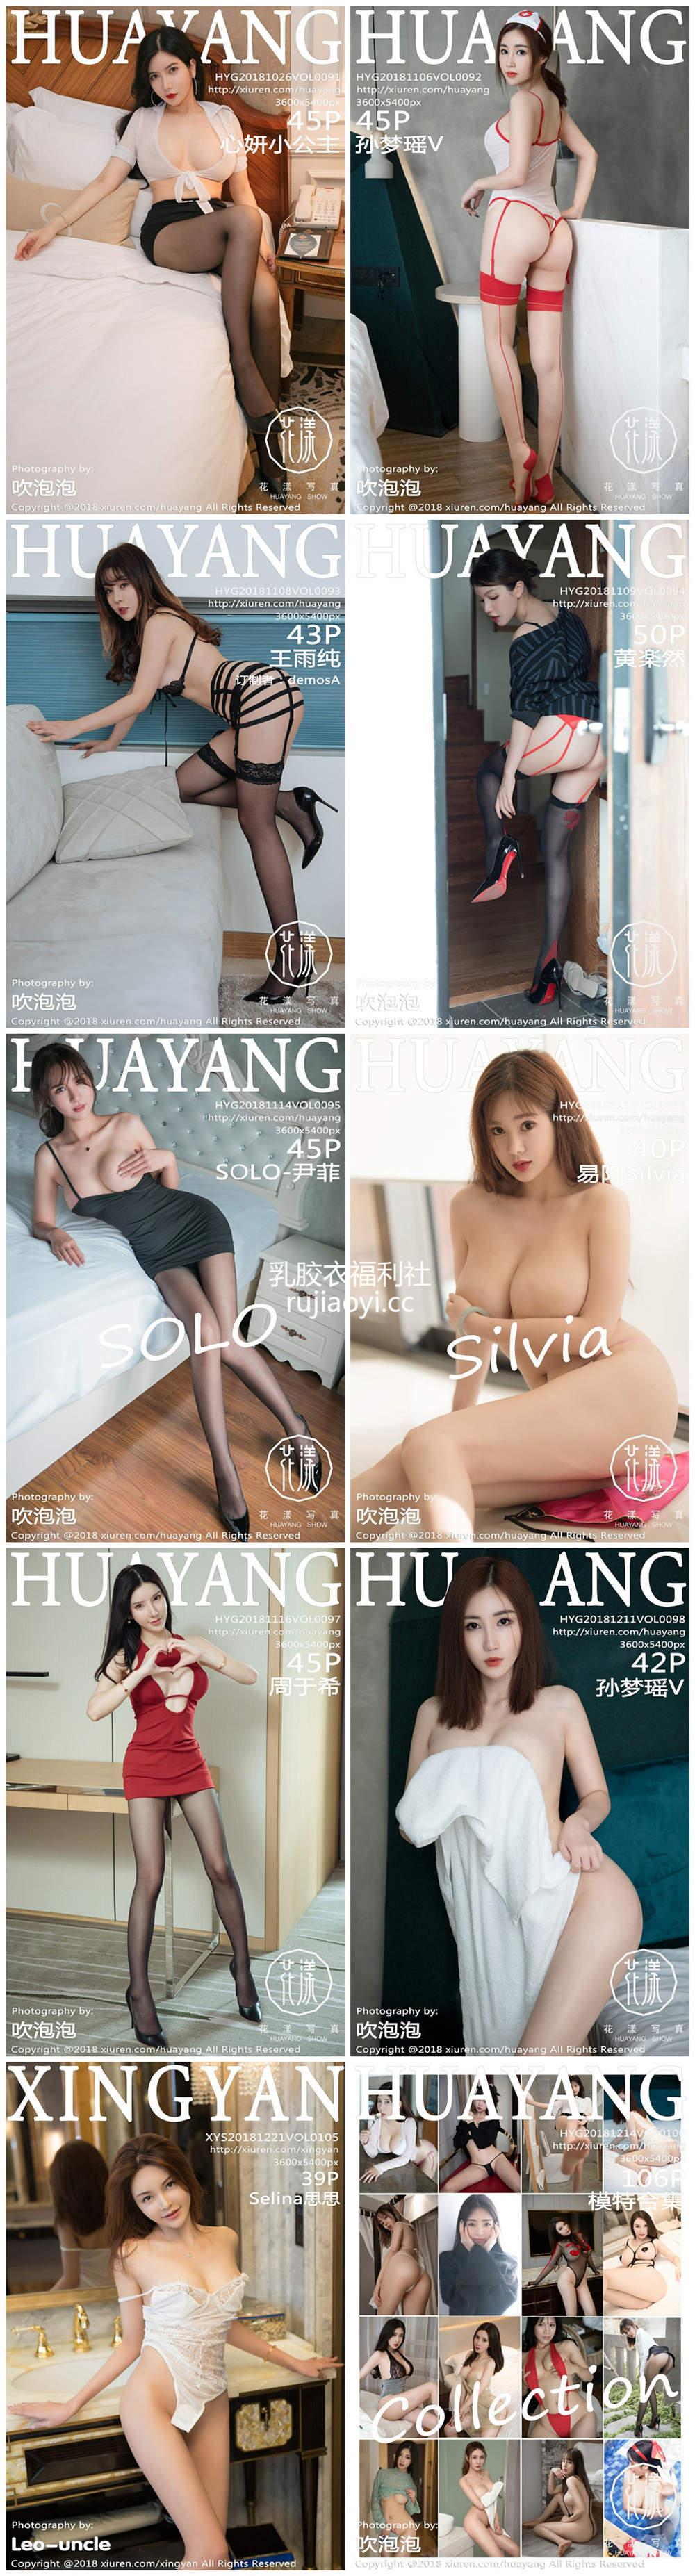 [HuaYang花漾] Vol.091-100 秀人系列 10期性感写真百度云合集下载